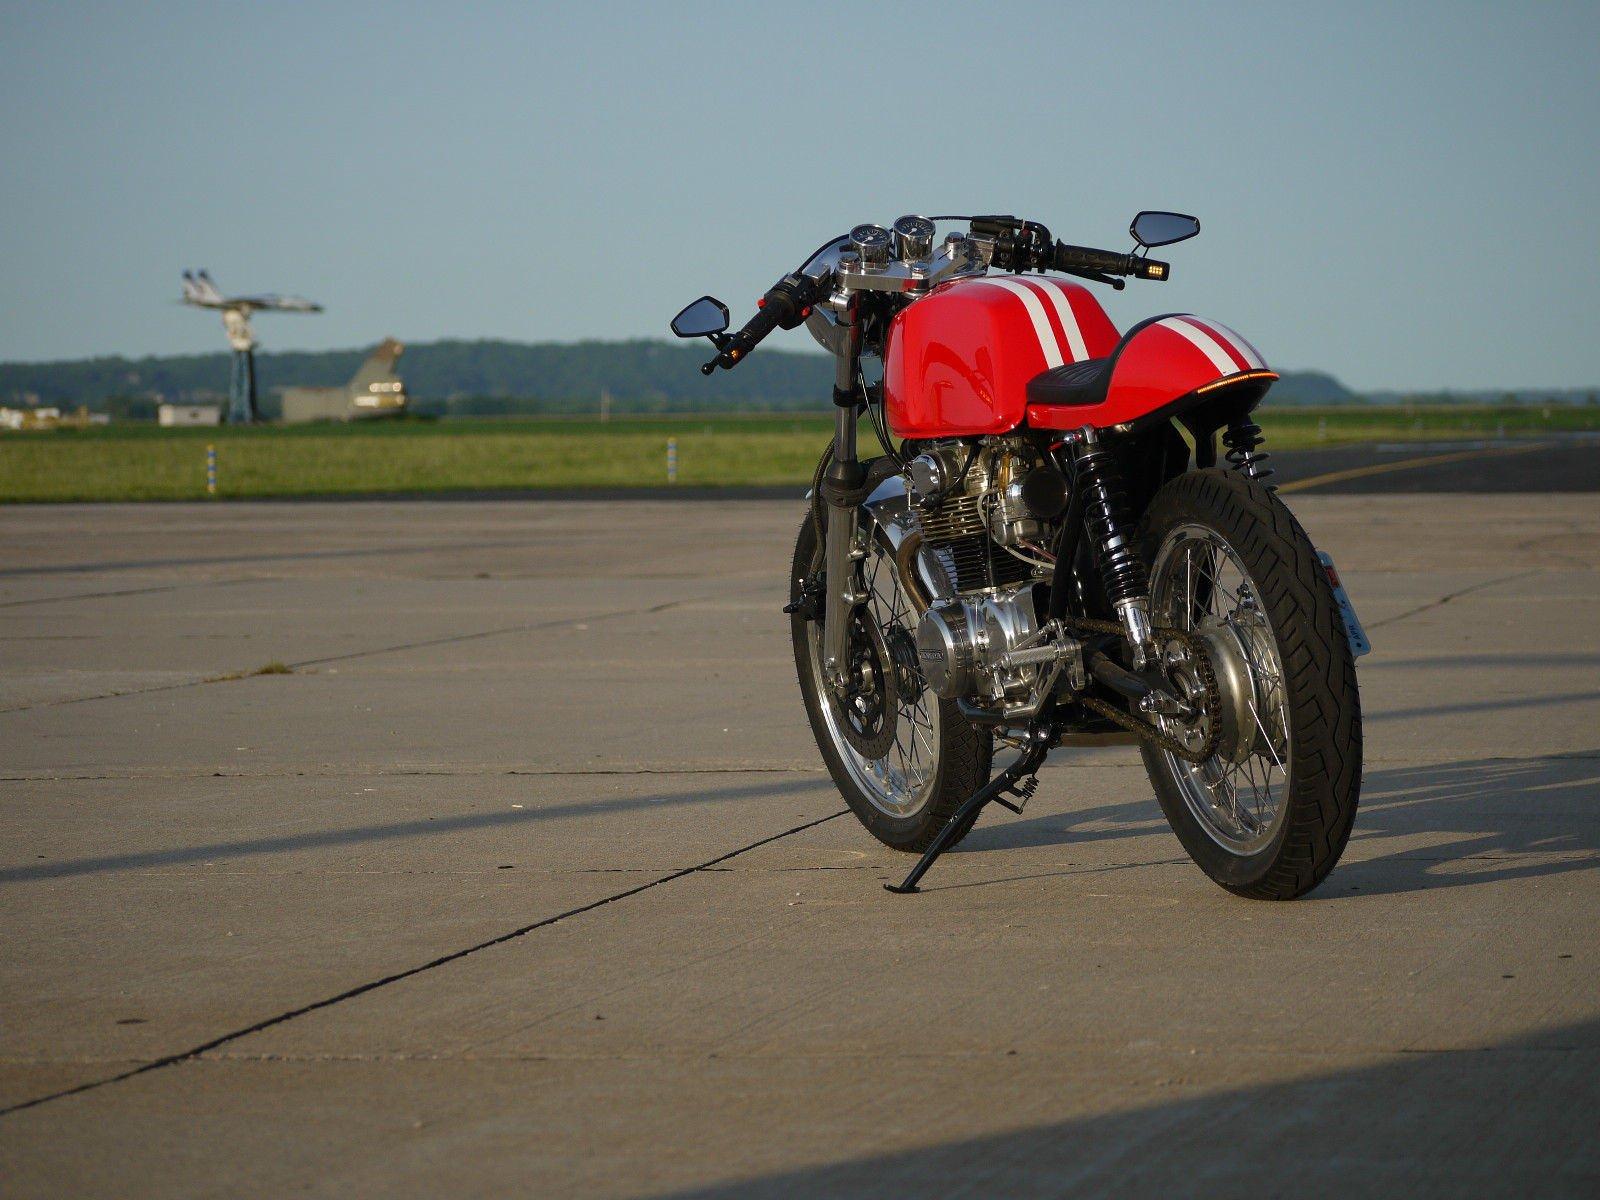 Honda_CB350_Cafe_Racer_12. Honda_CB350_Cafe_Racer_11. Honda_CB350_Cafe_Racer_10. Honda_CB350_Cafe_Racer_9